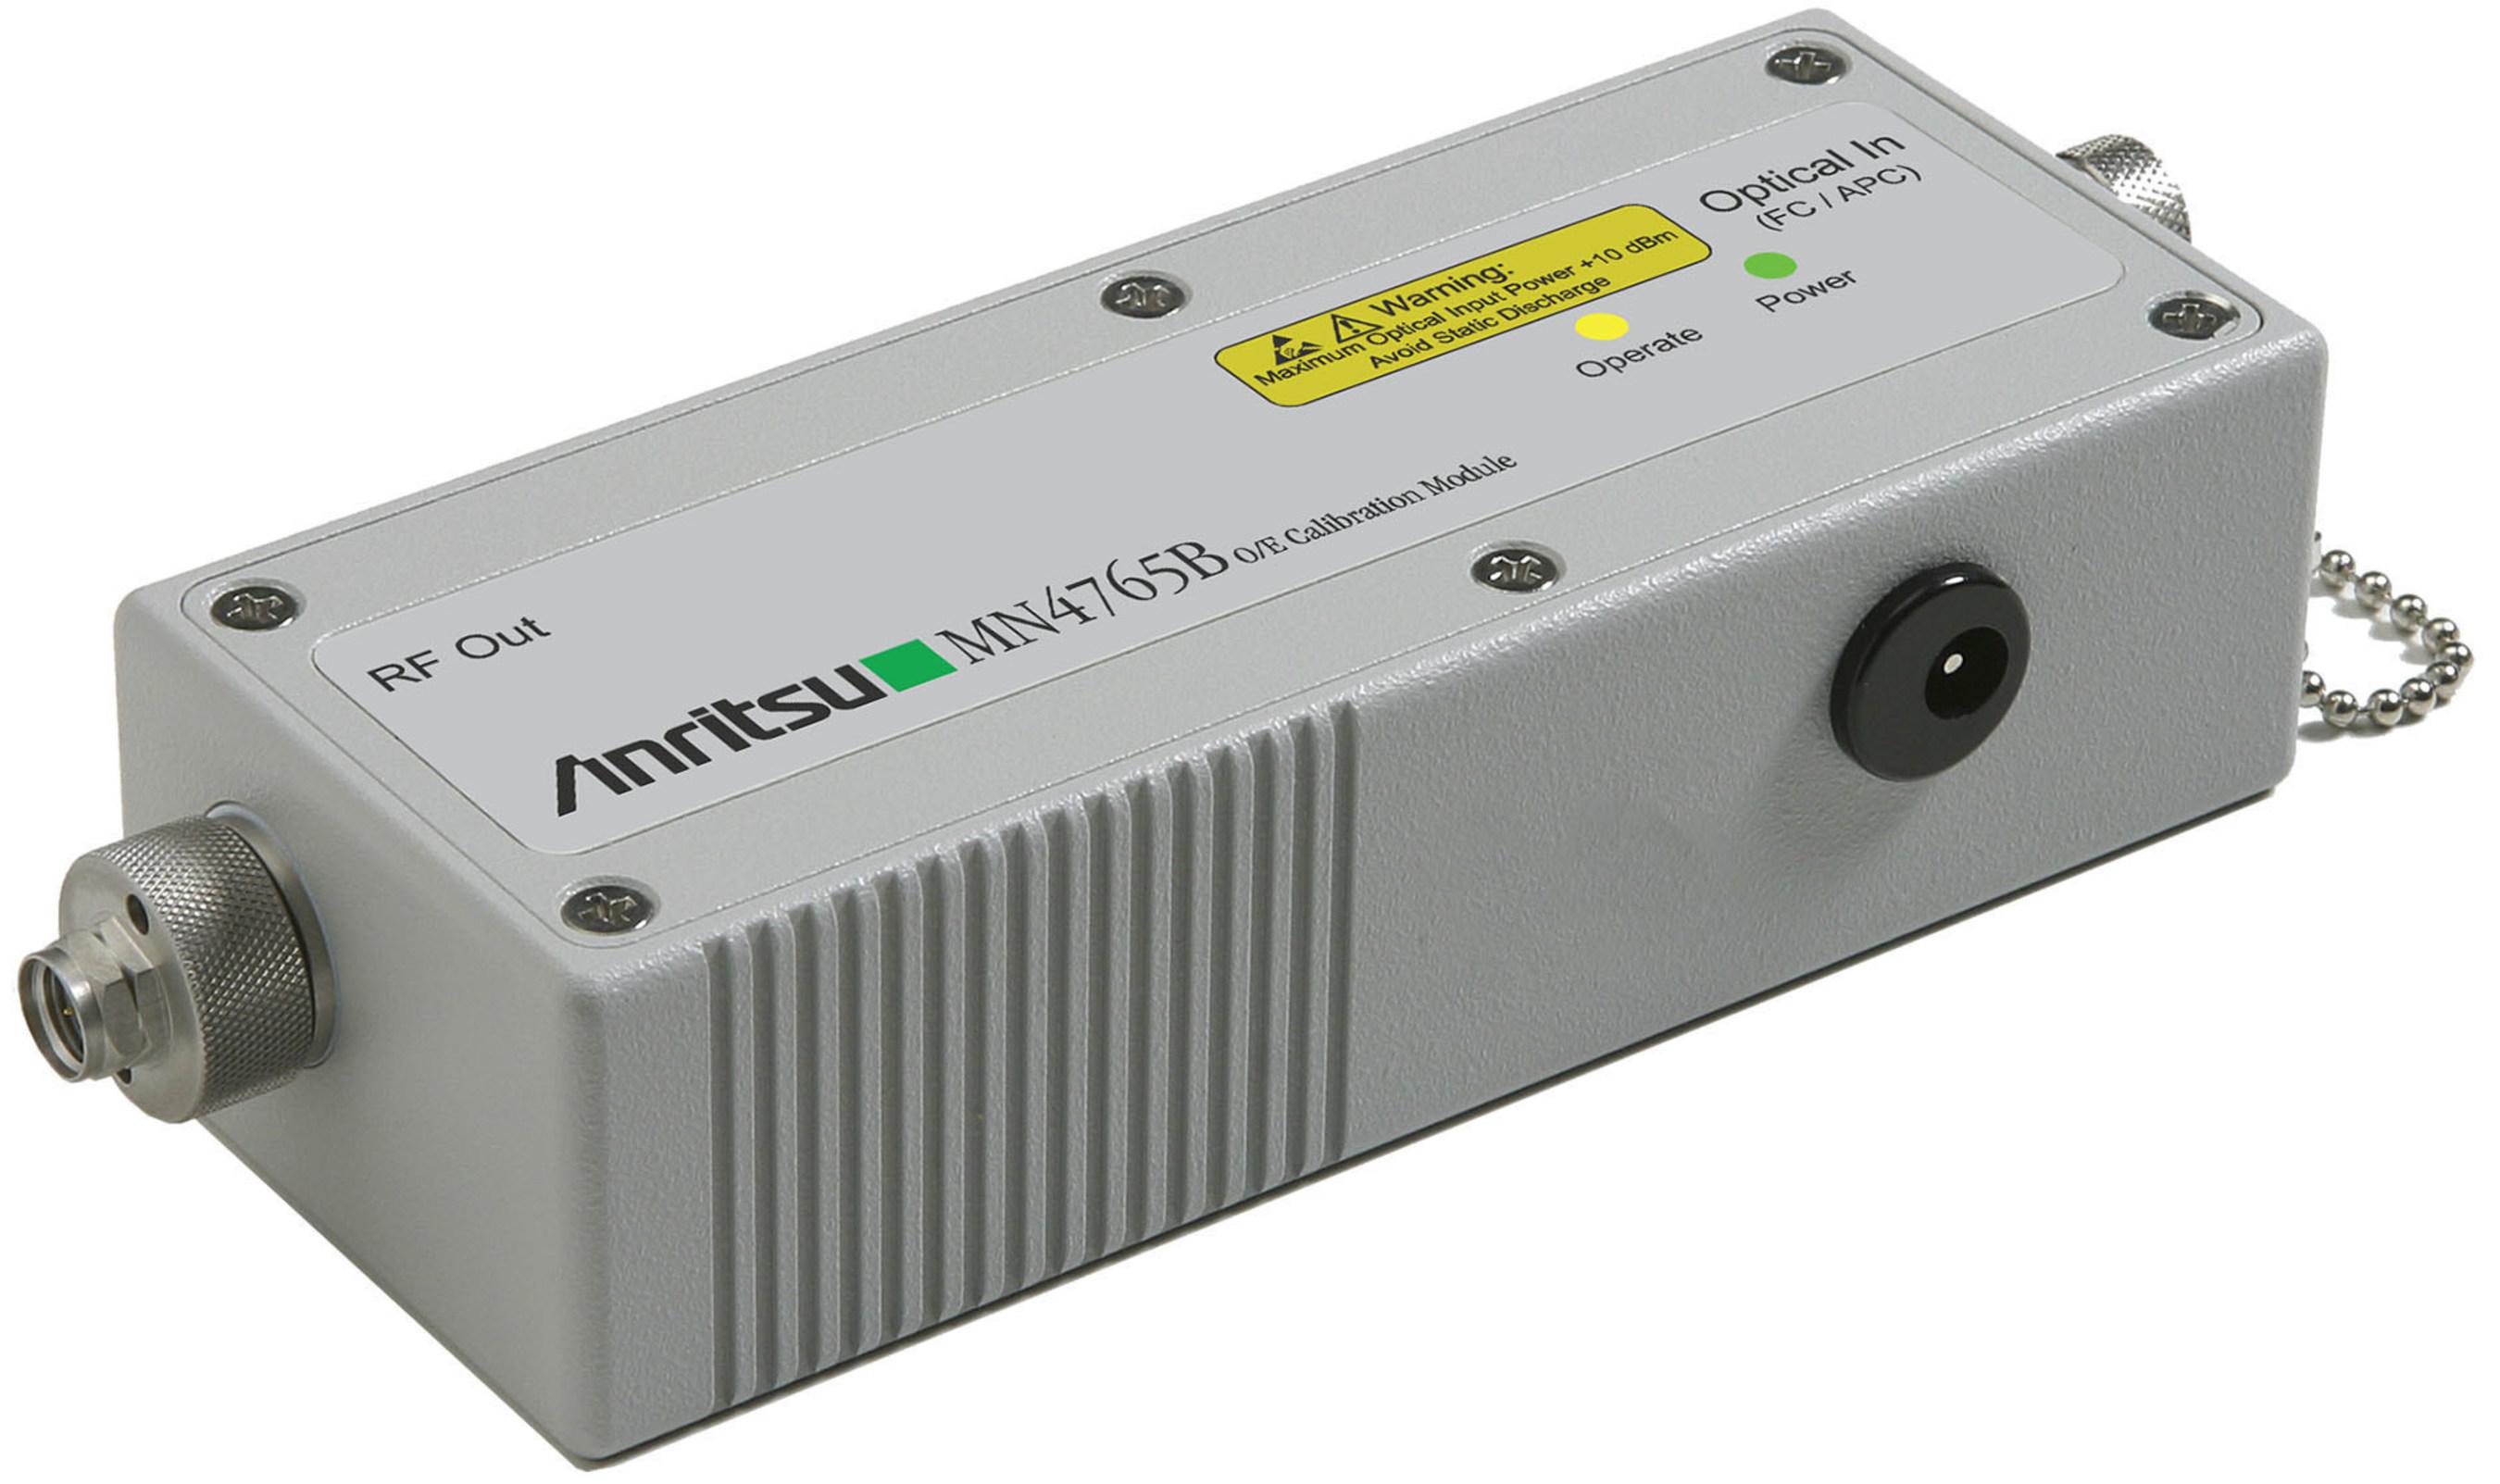 Anritsu introduces O/E calibration modules that add dual wavelength measurement capability to VectorStar VNA family.